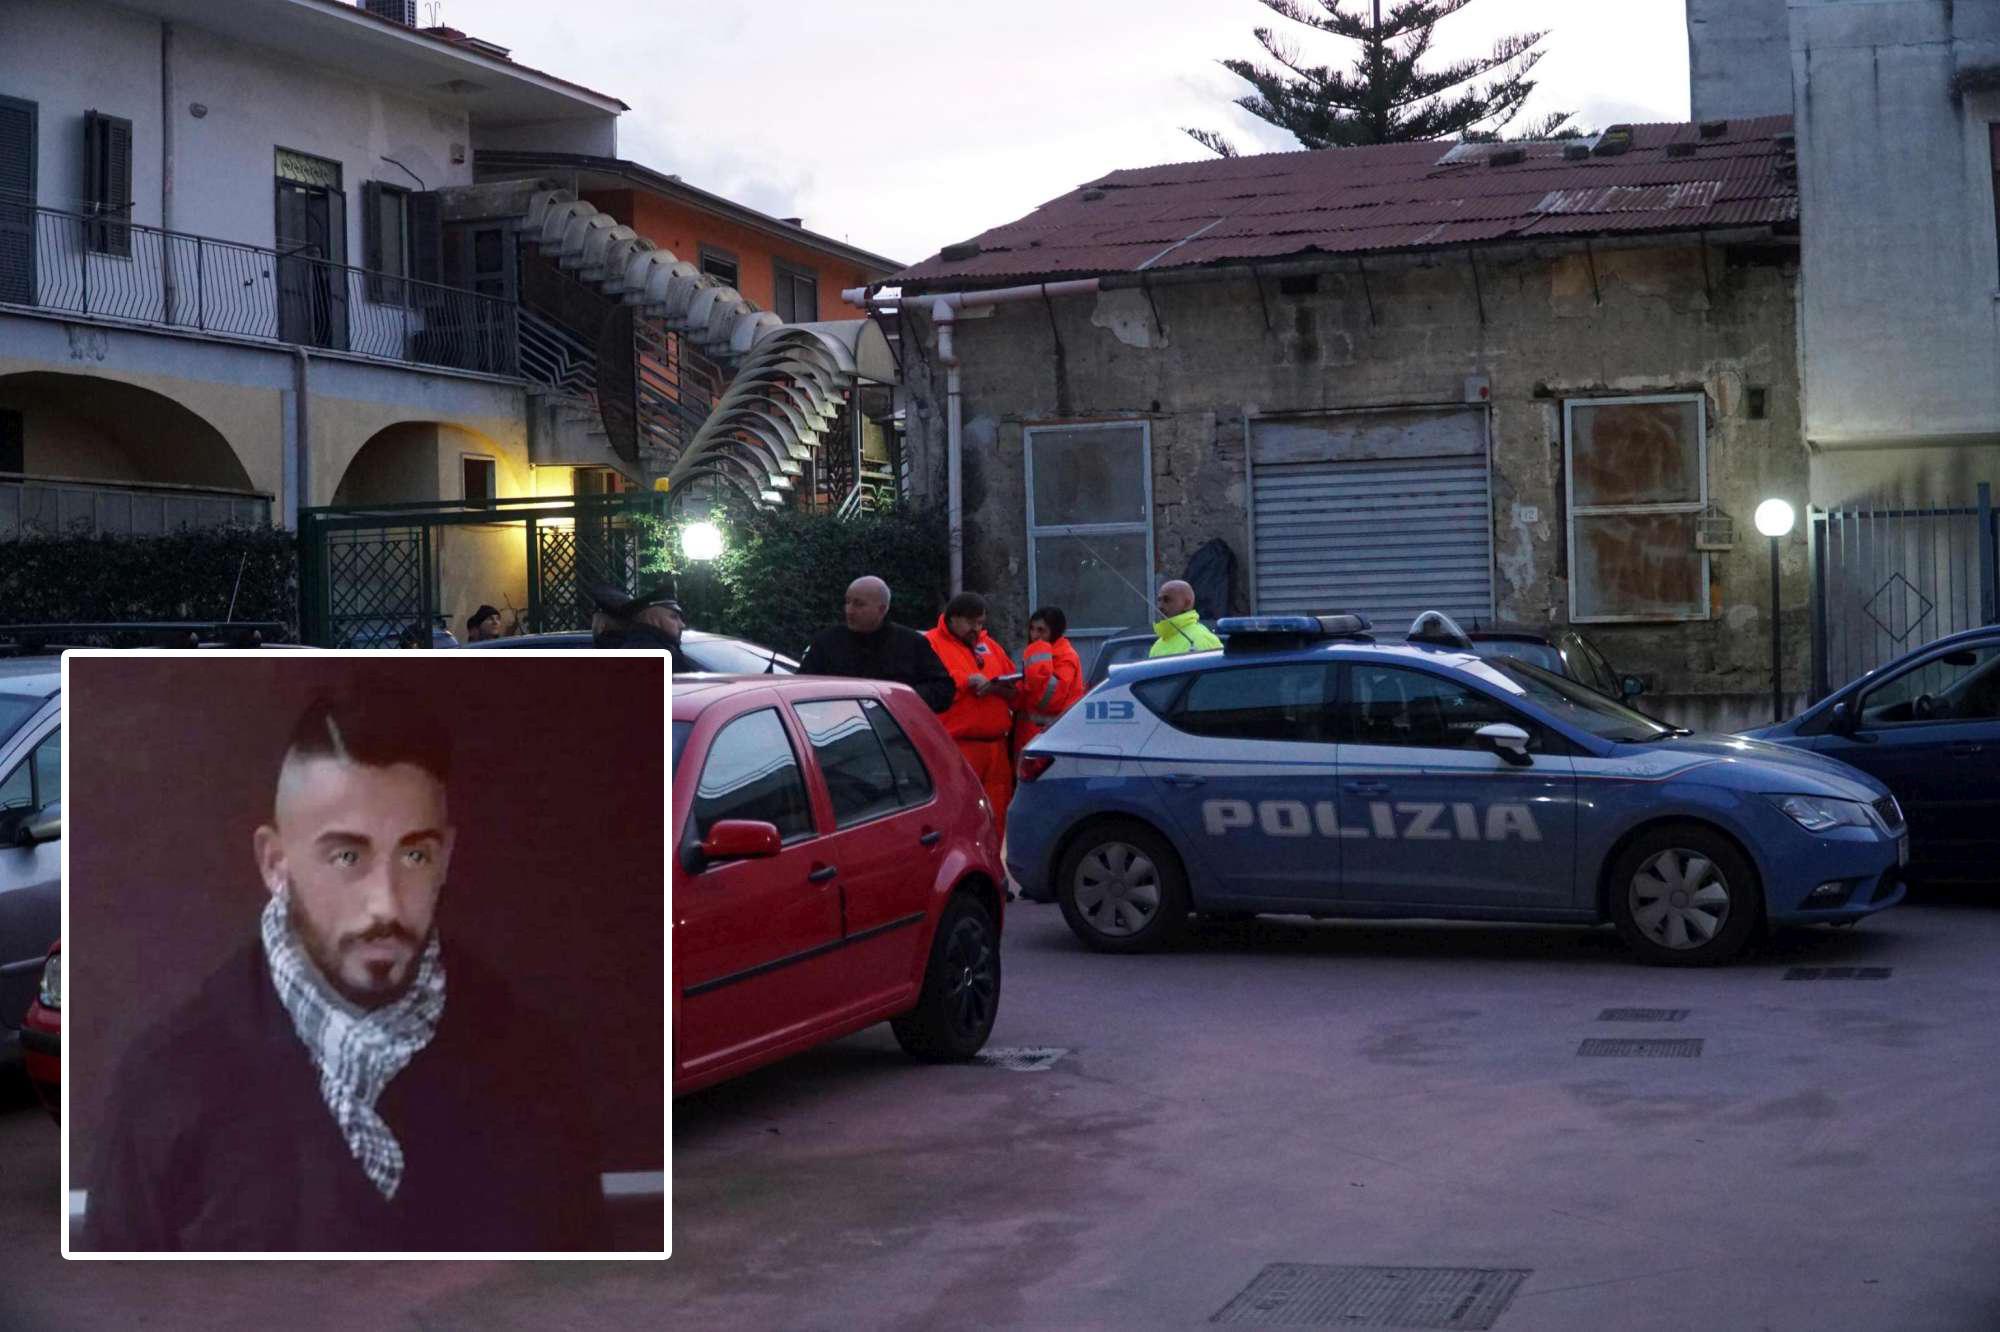 Bimbo trovato morto nel Napoletano, ferita la sorella